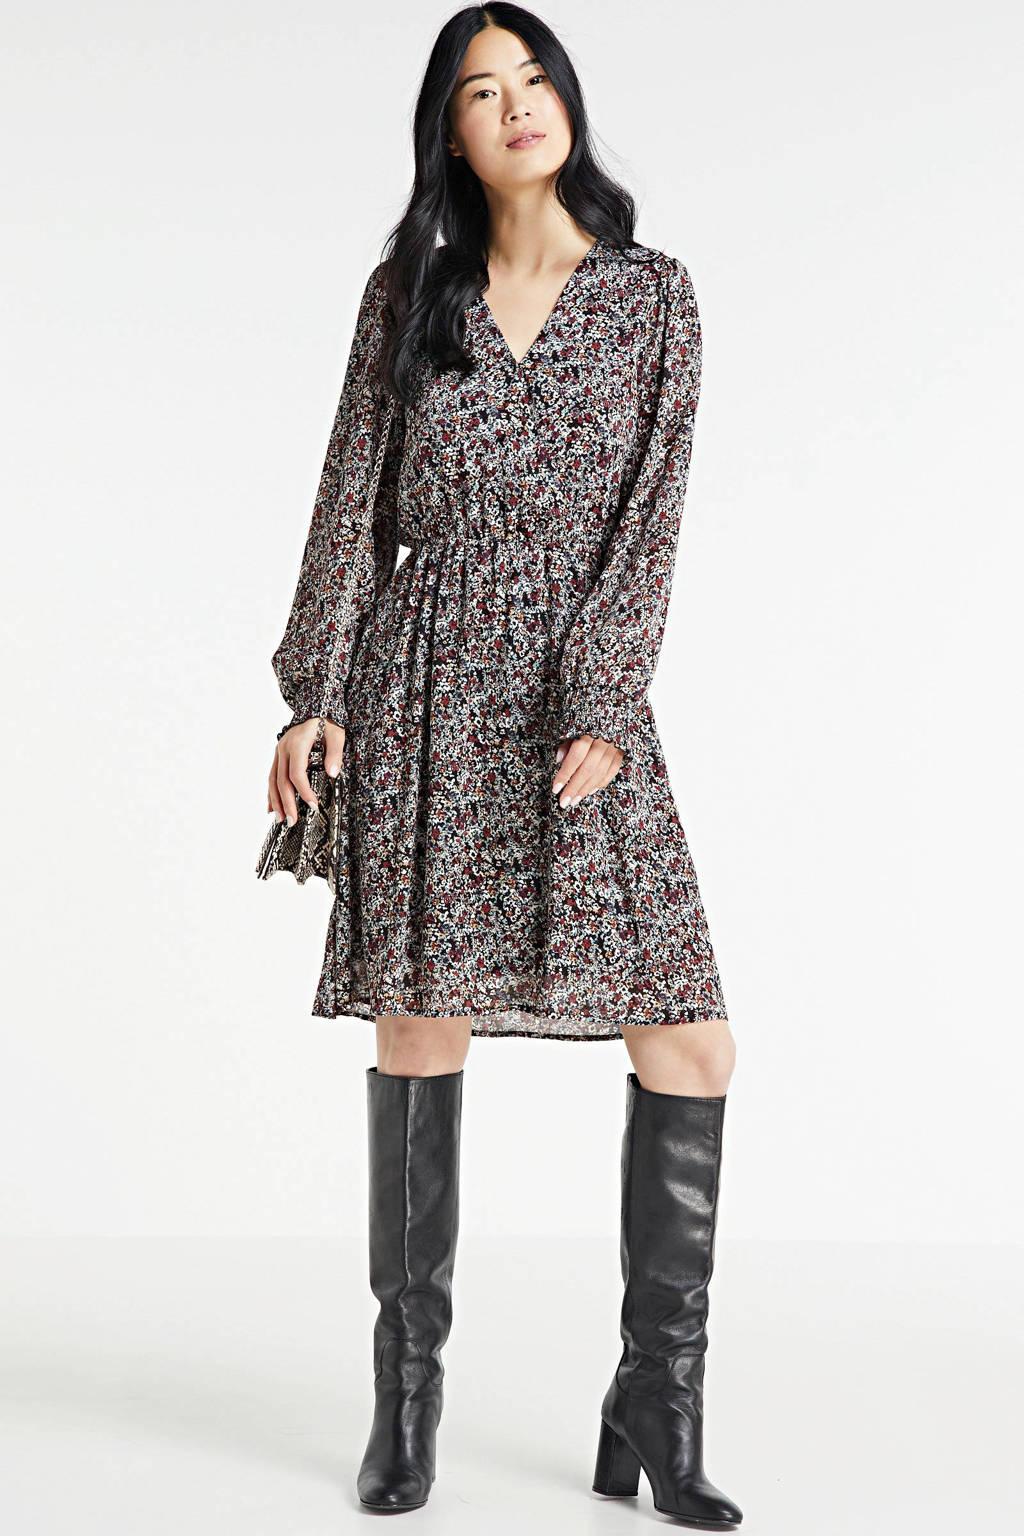 MSCH Copenhagen gebloemde jurk Glorie Rikkelie zwart/ donkerrood, Zwart/ donkerrood